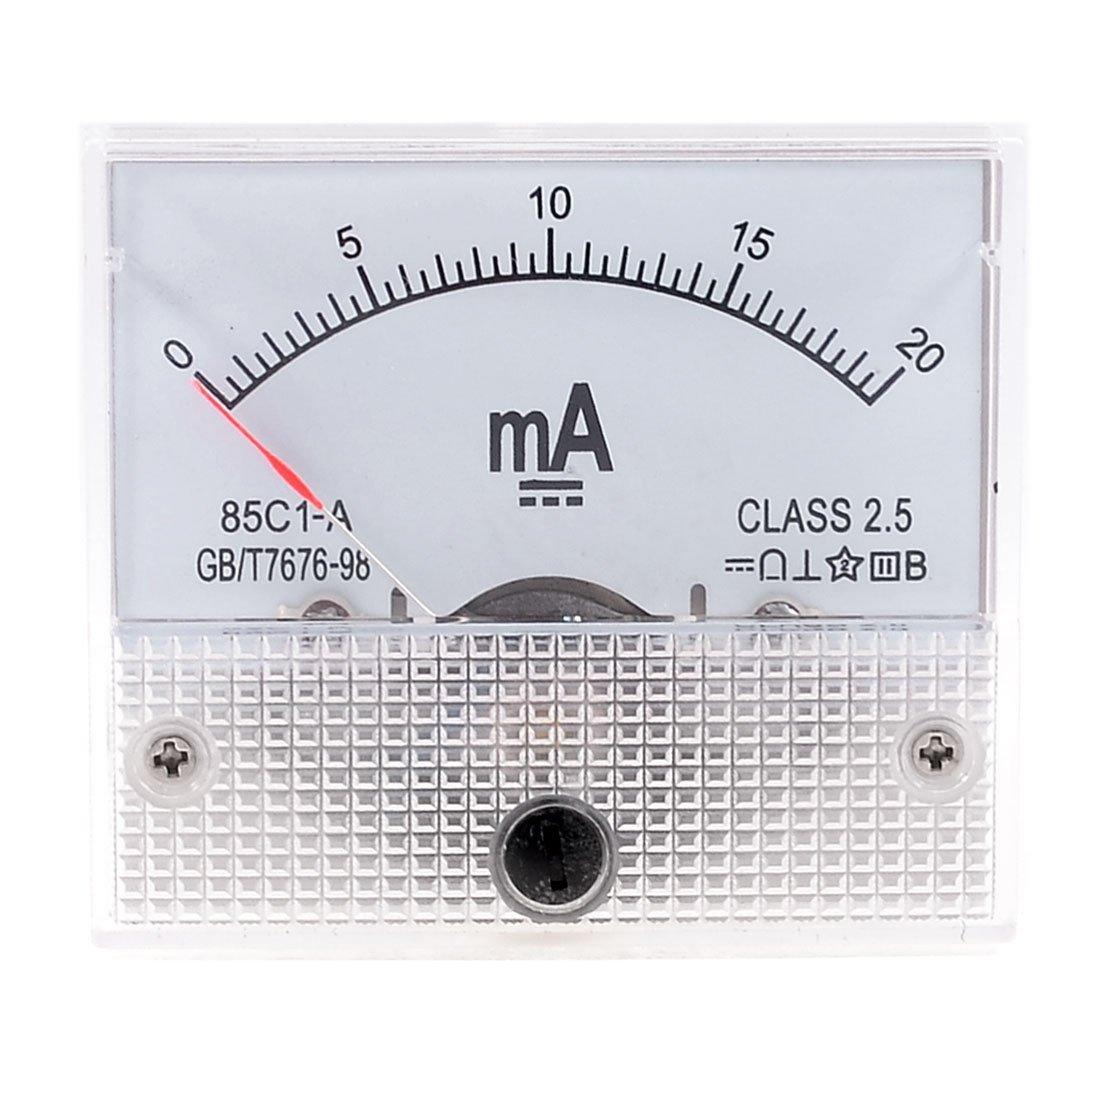 Sourcingmap a13051400ux0383 - Dc 0-20ma corrente metri pannello analogico amperometro 85c1-a